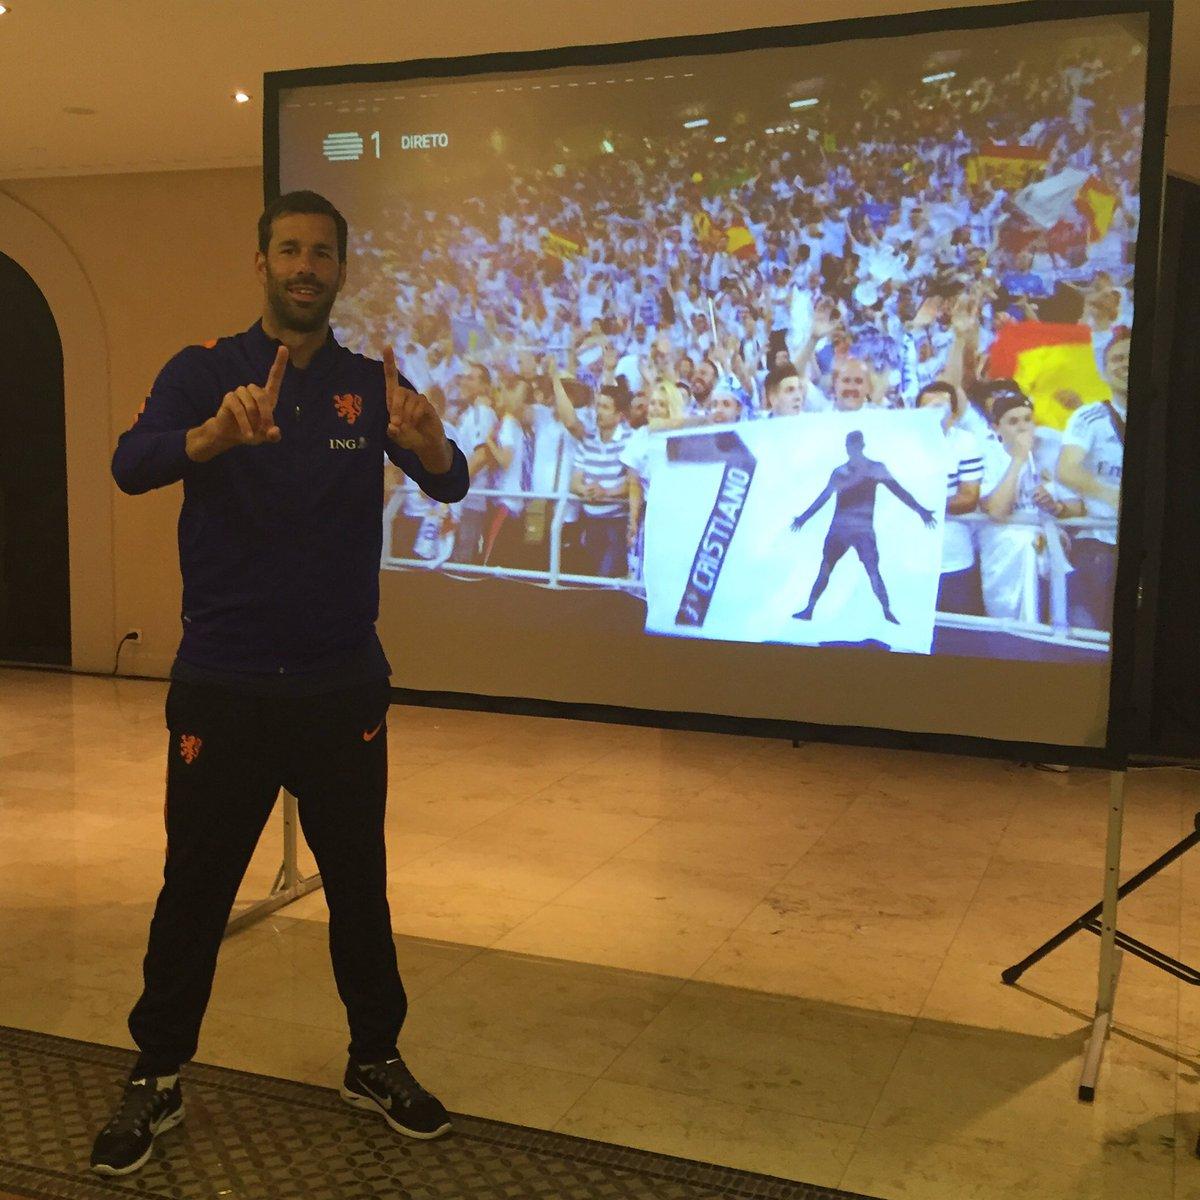 #LaUndecima!! Hala Madrid!! https://t.co/iAEKI3rPiw